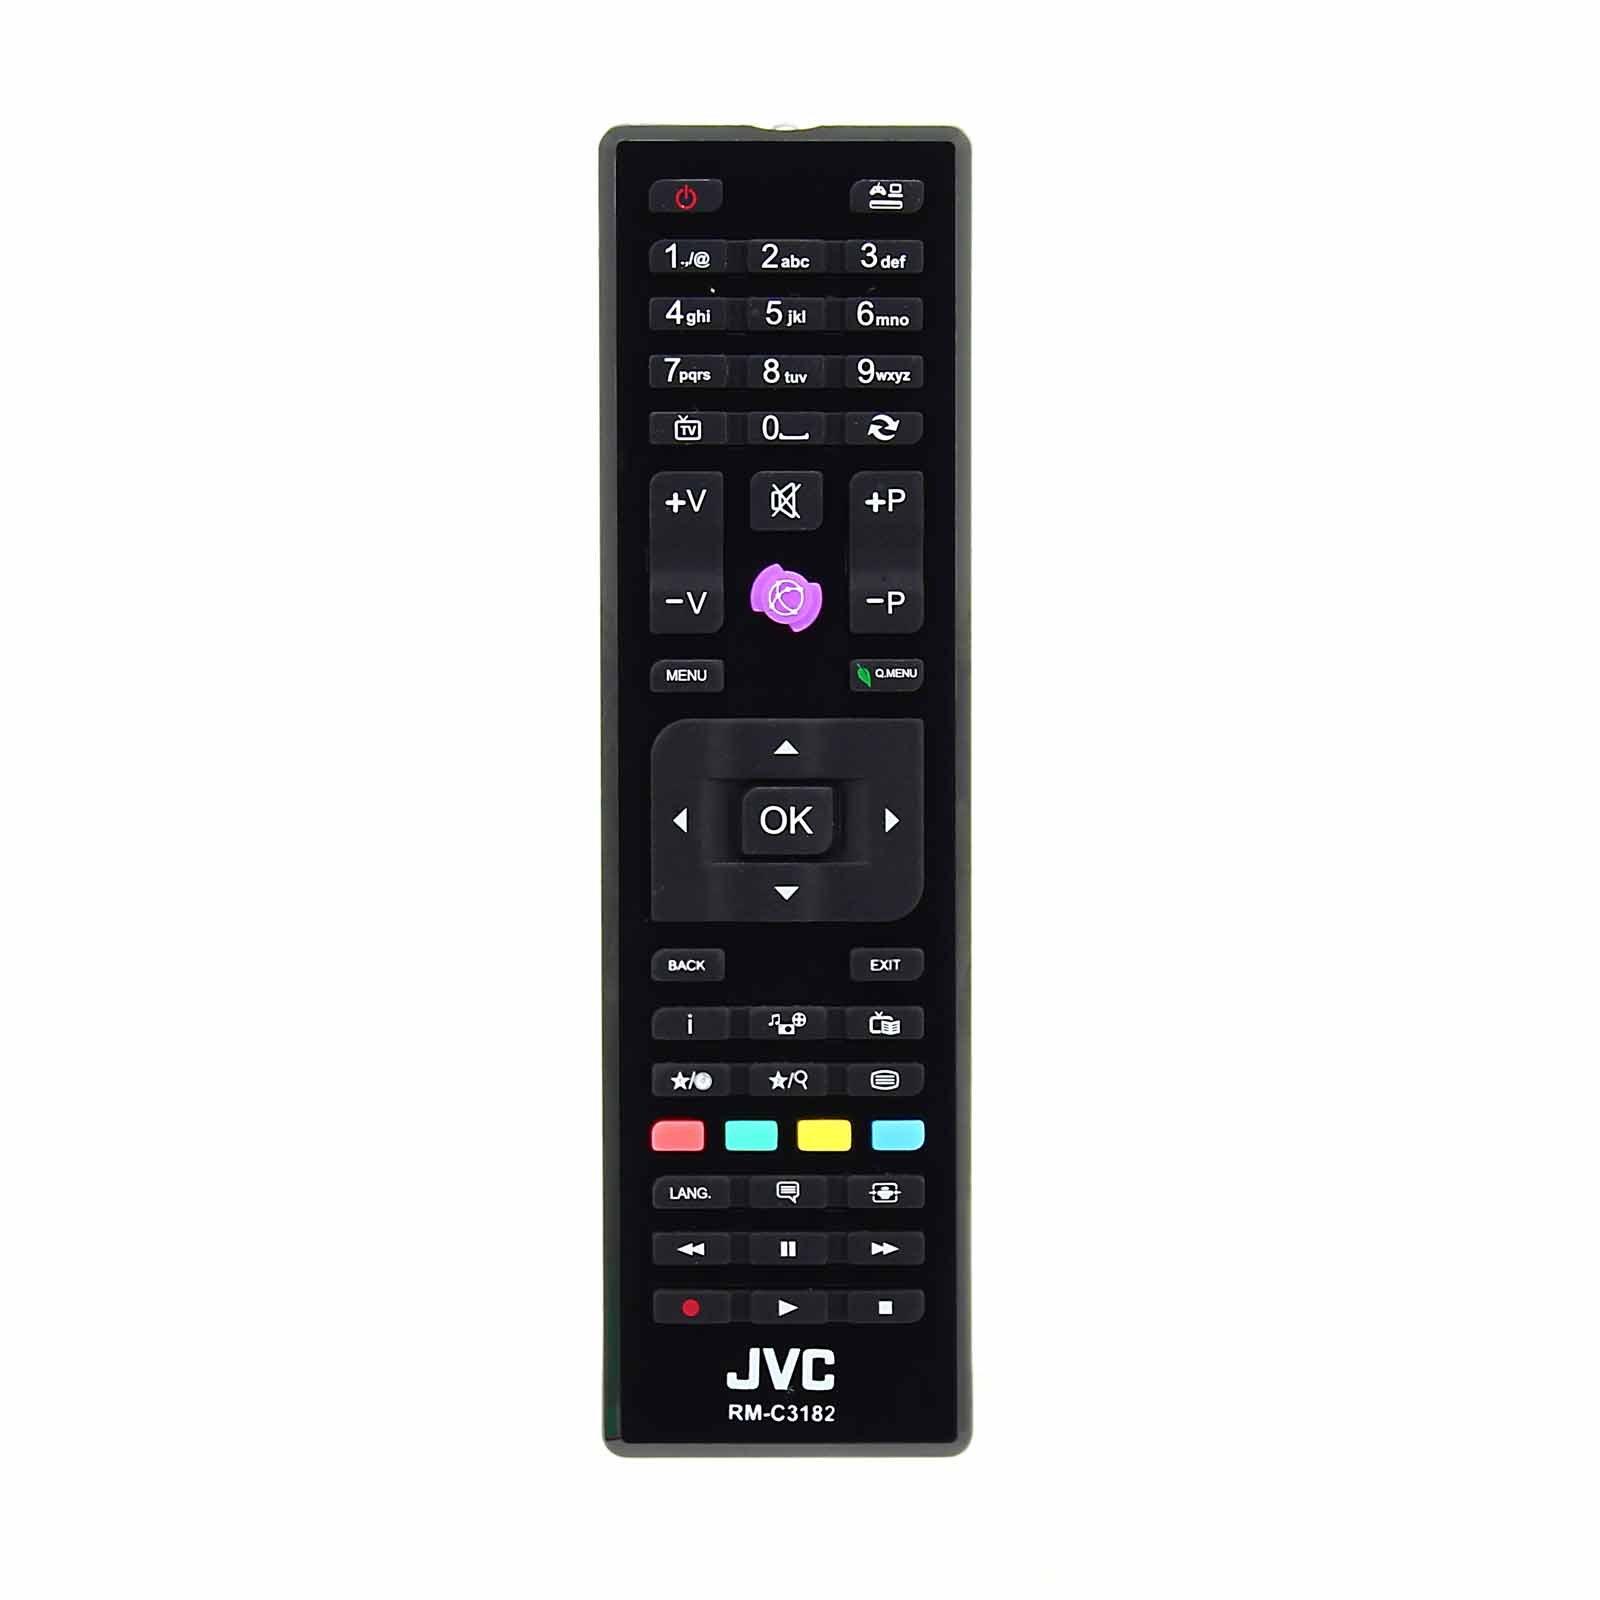 JVC 23249527 RM-C3182 RMC3182 Control Remoto Genuino para televisores LCD LED 3D HD Smart: Amazon.es: Electrónica